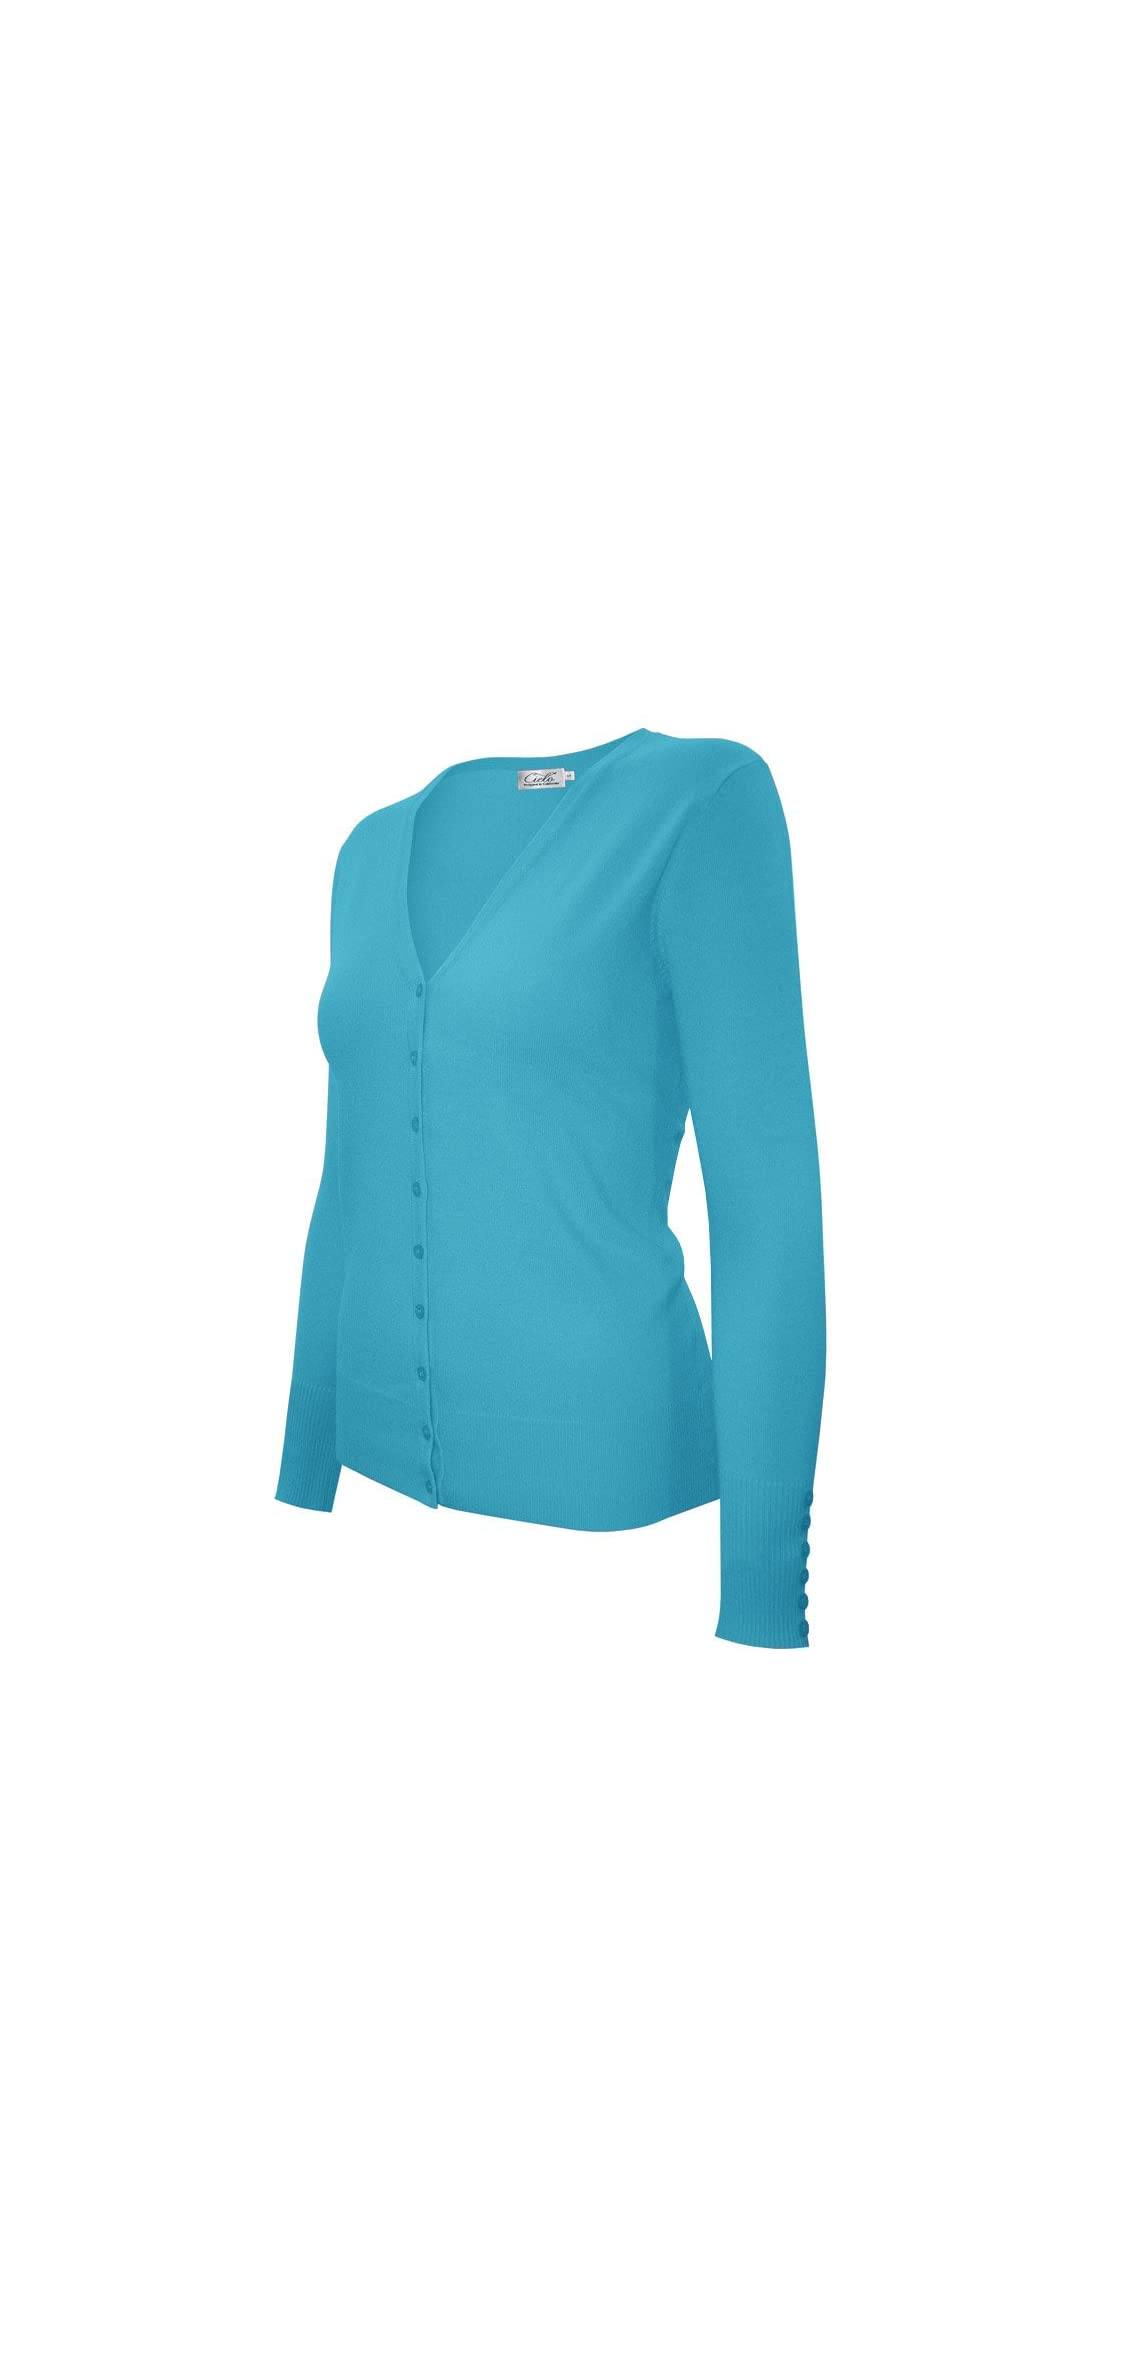 Women's Classic Knit Silk Soft Cardigan Sweater, V-neck